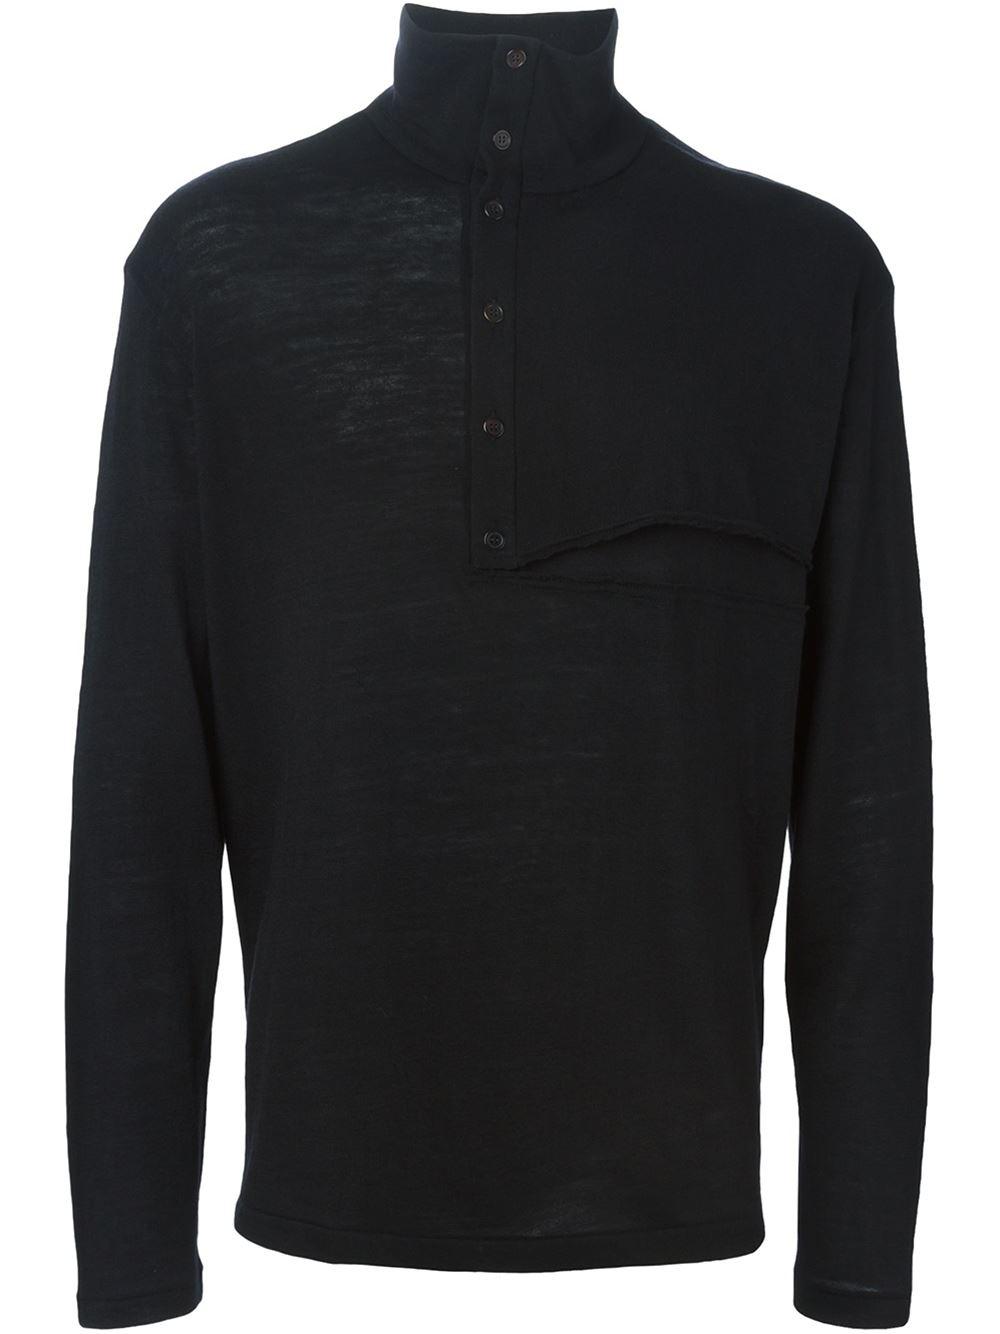 Yohji yamamoto long sleeved wool polo shirt in black for for Long sleeve wool polo shirts